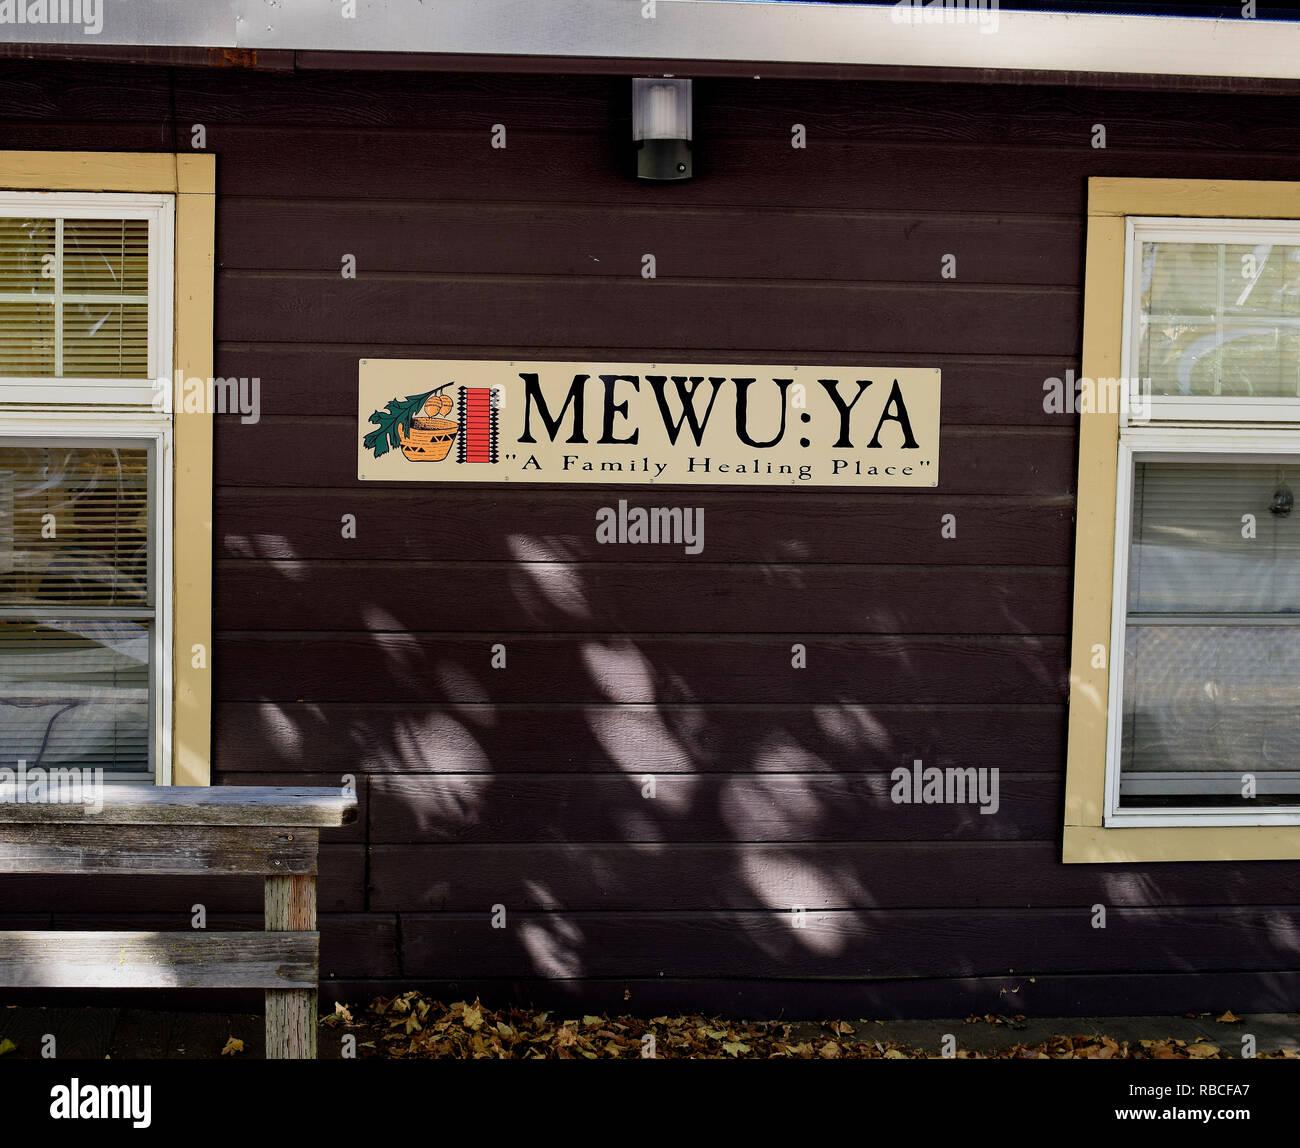 MEWU:YA Family Healing place sign, Tuolumne, California - Stock Image